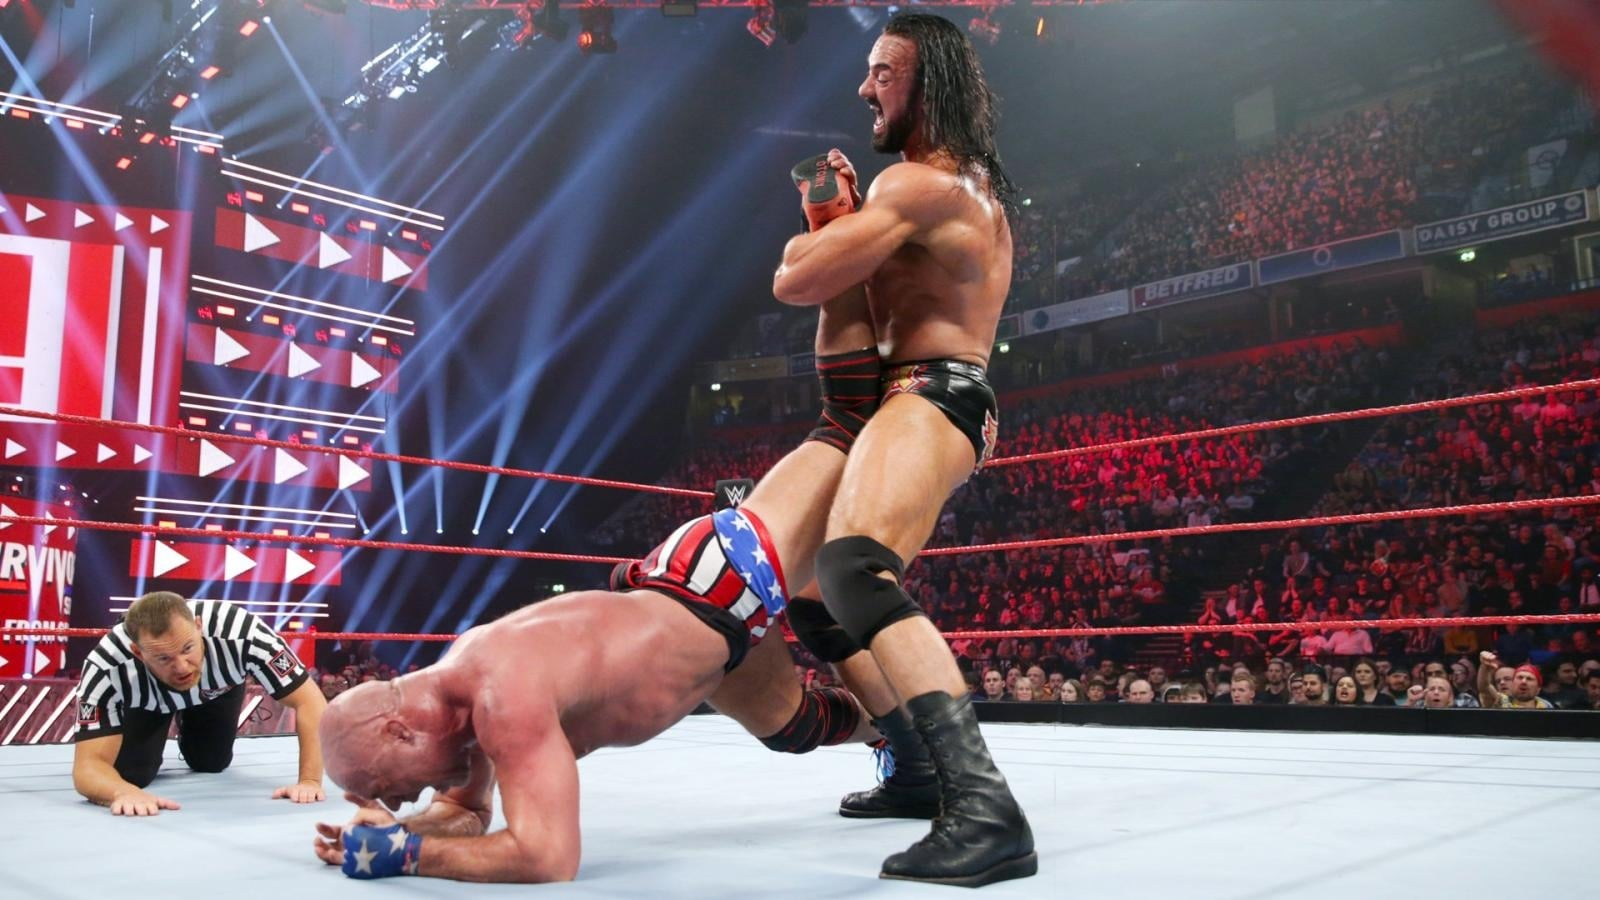 WWE Raw Season 26 :Episode 45  November 5, 2018 (Manchester, England)